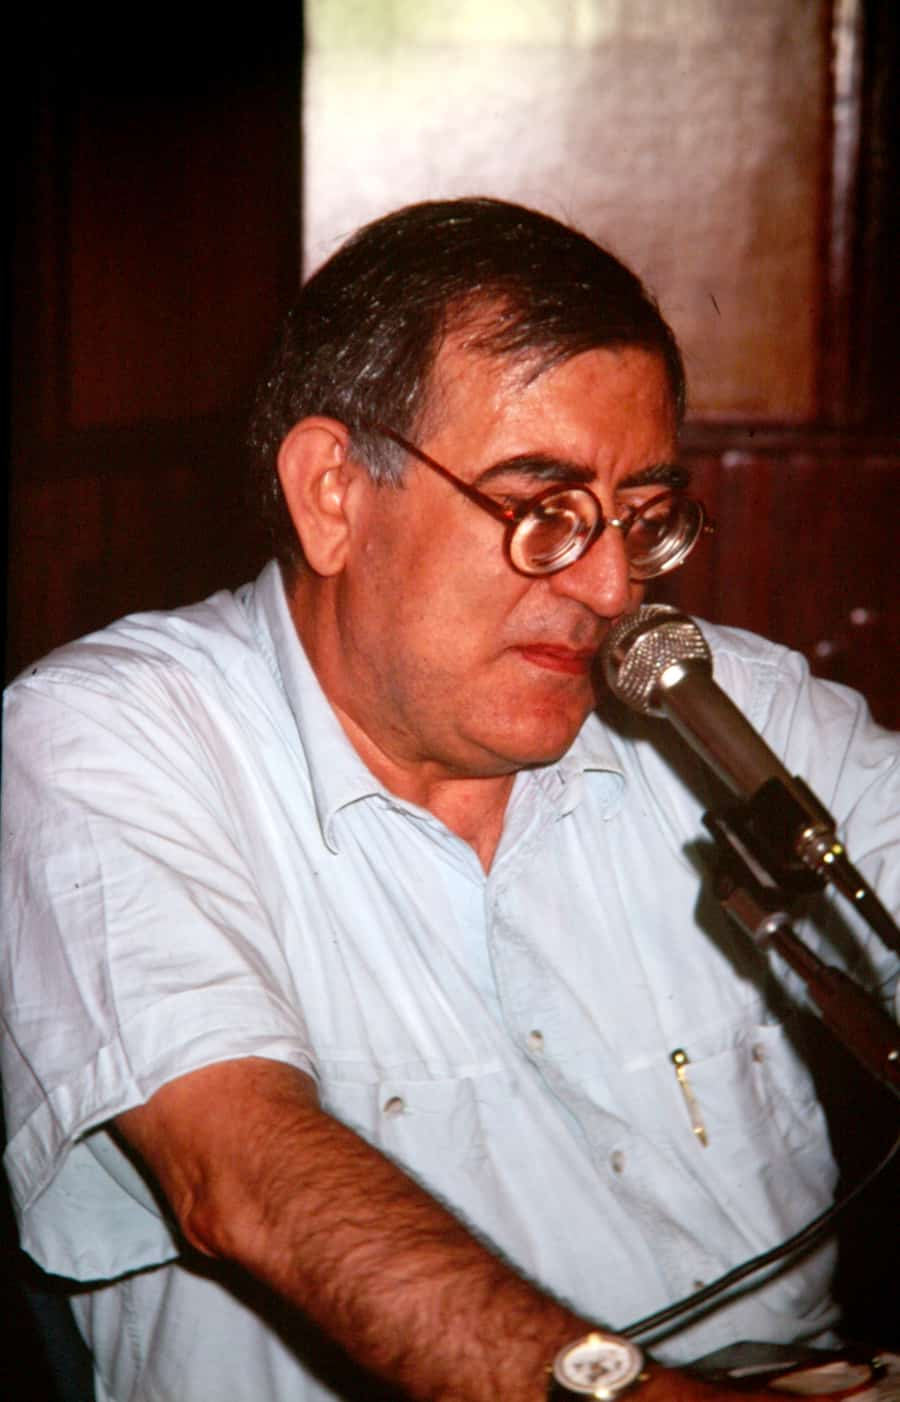 Vittorio Fagone, 1994. Rassegna internazionale video d'autore. Taormina.